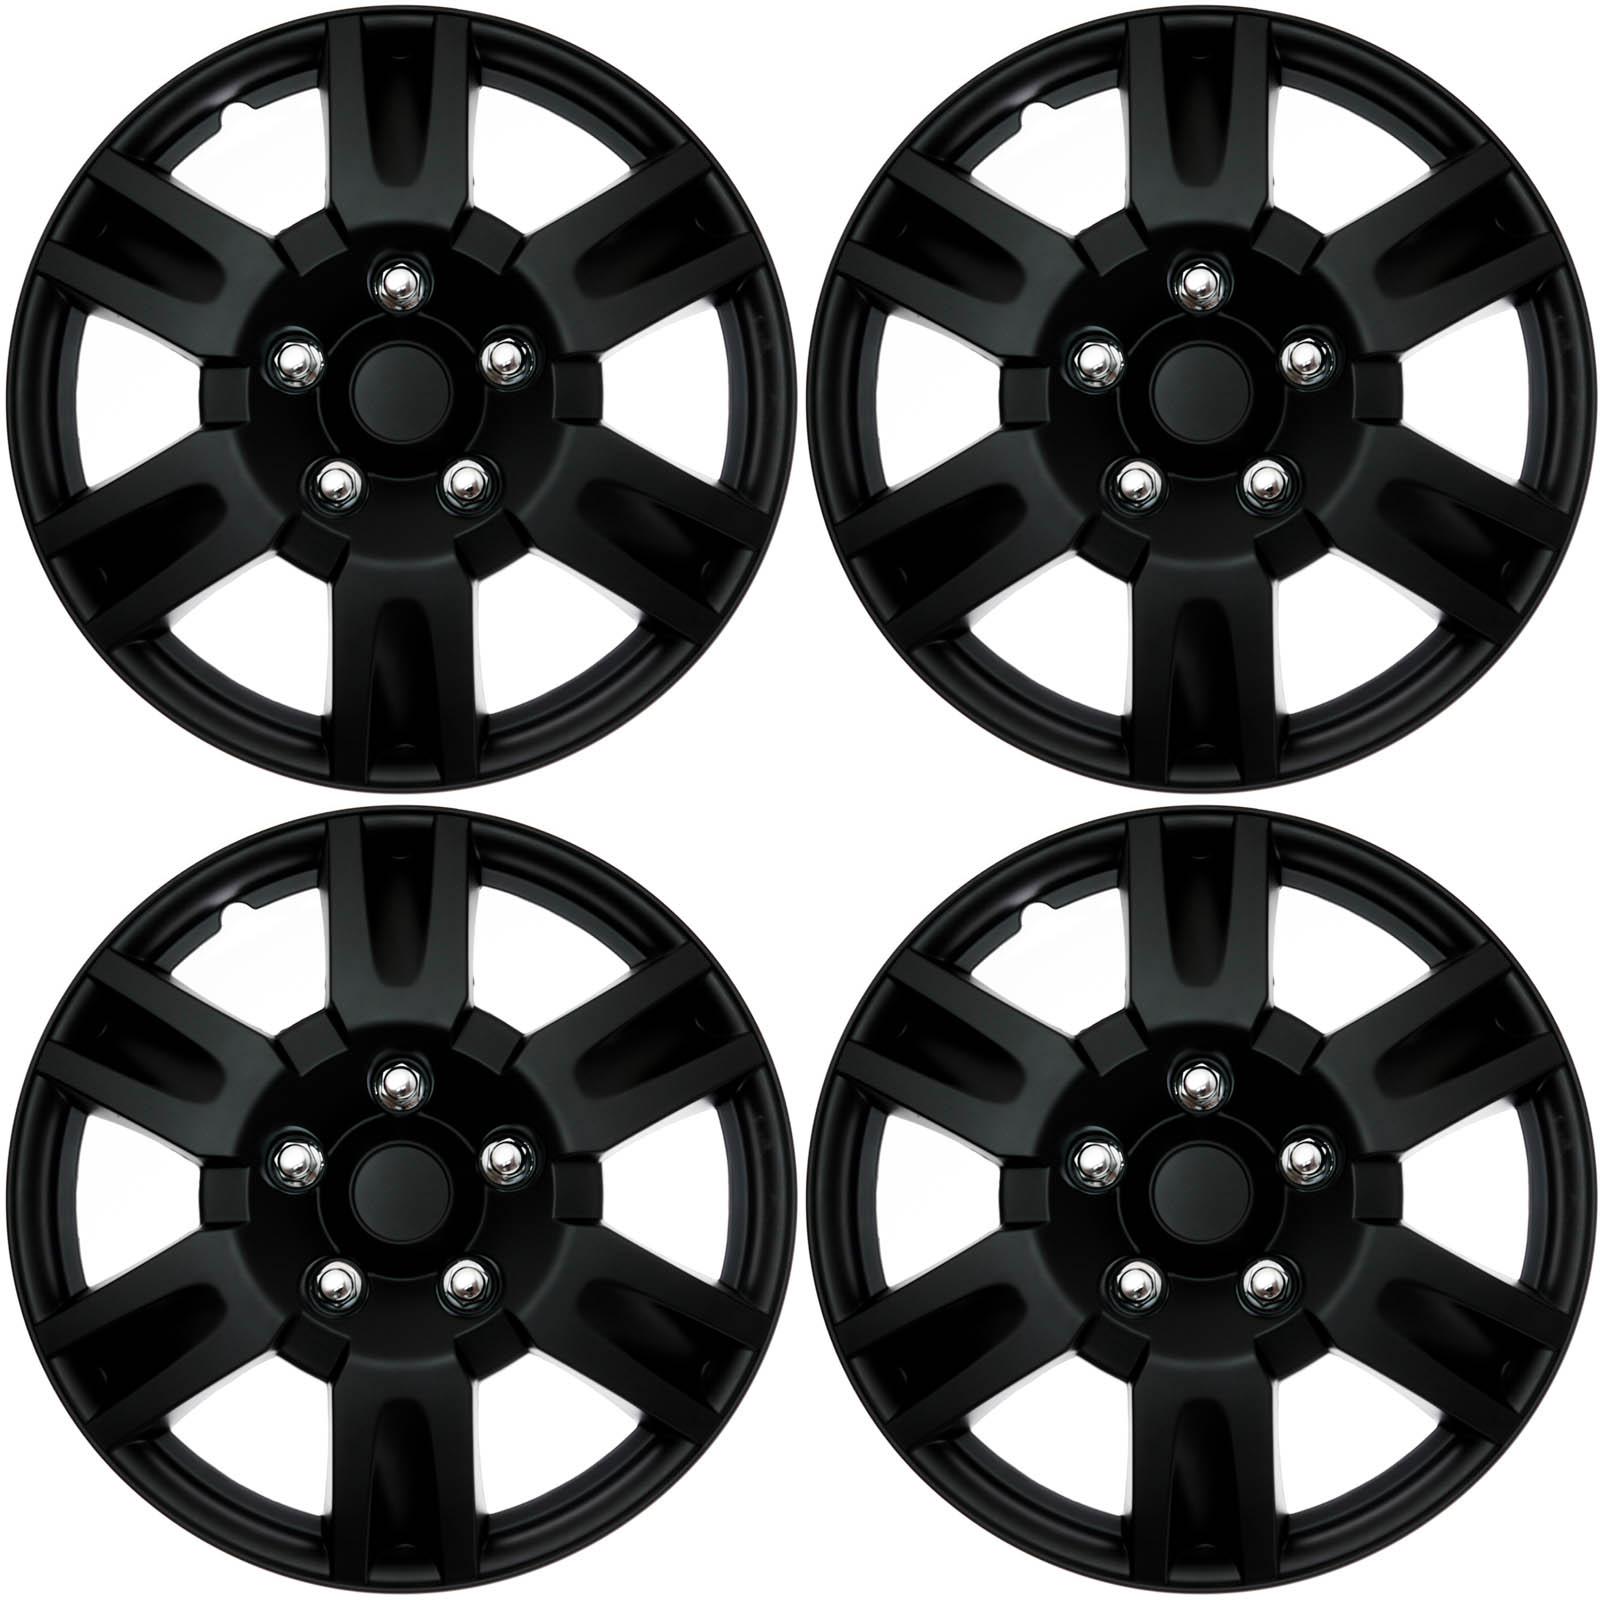 4 Pc Set Of 15 Matte Black Hub Caps Full Lug Skin Rim Cover For Oem 2000 Mercury Sable Dohc Engine Internal Diagram Steel Wheel